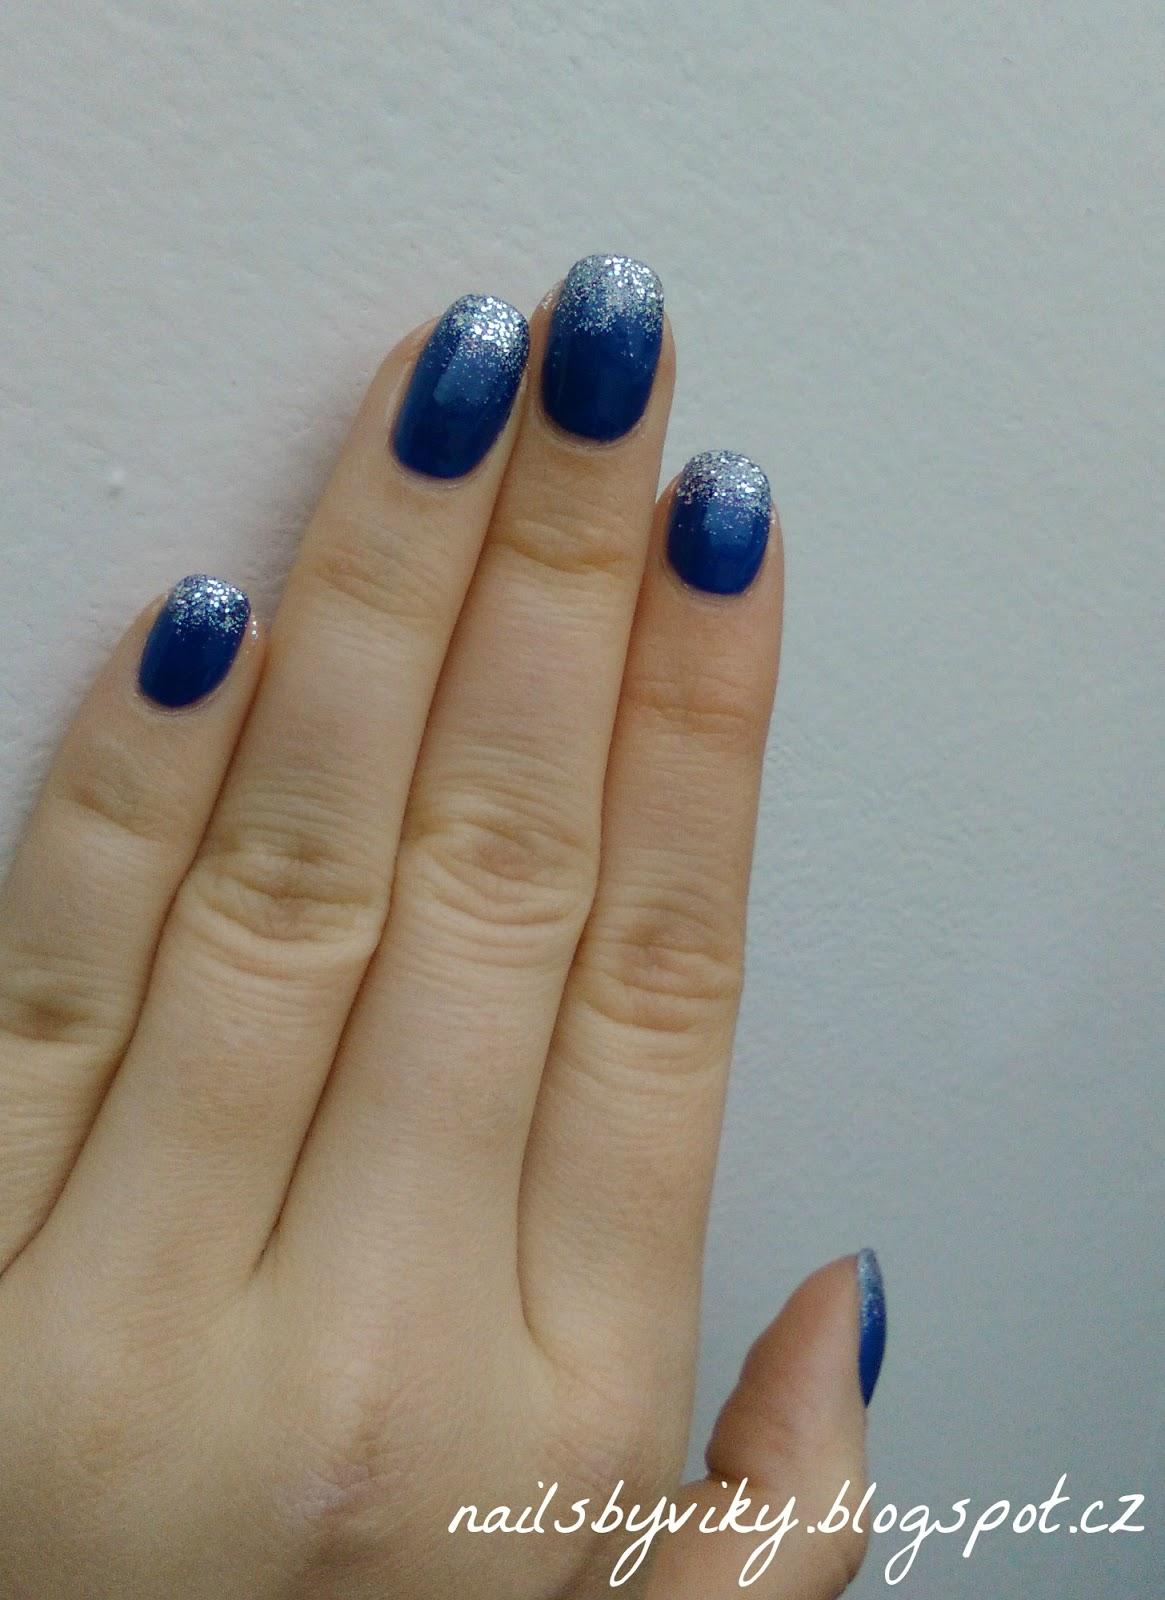 Nails By Viky 1 Adventni Nedele Trpytive Ombre Na Modre